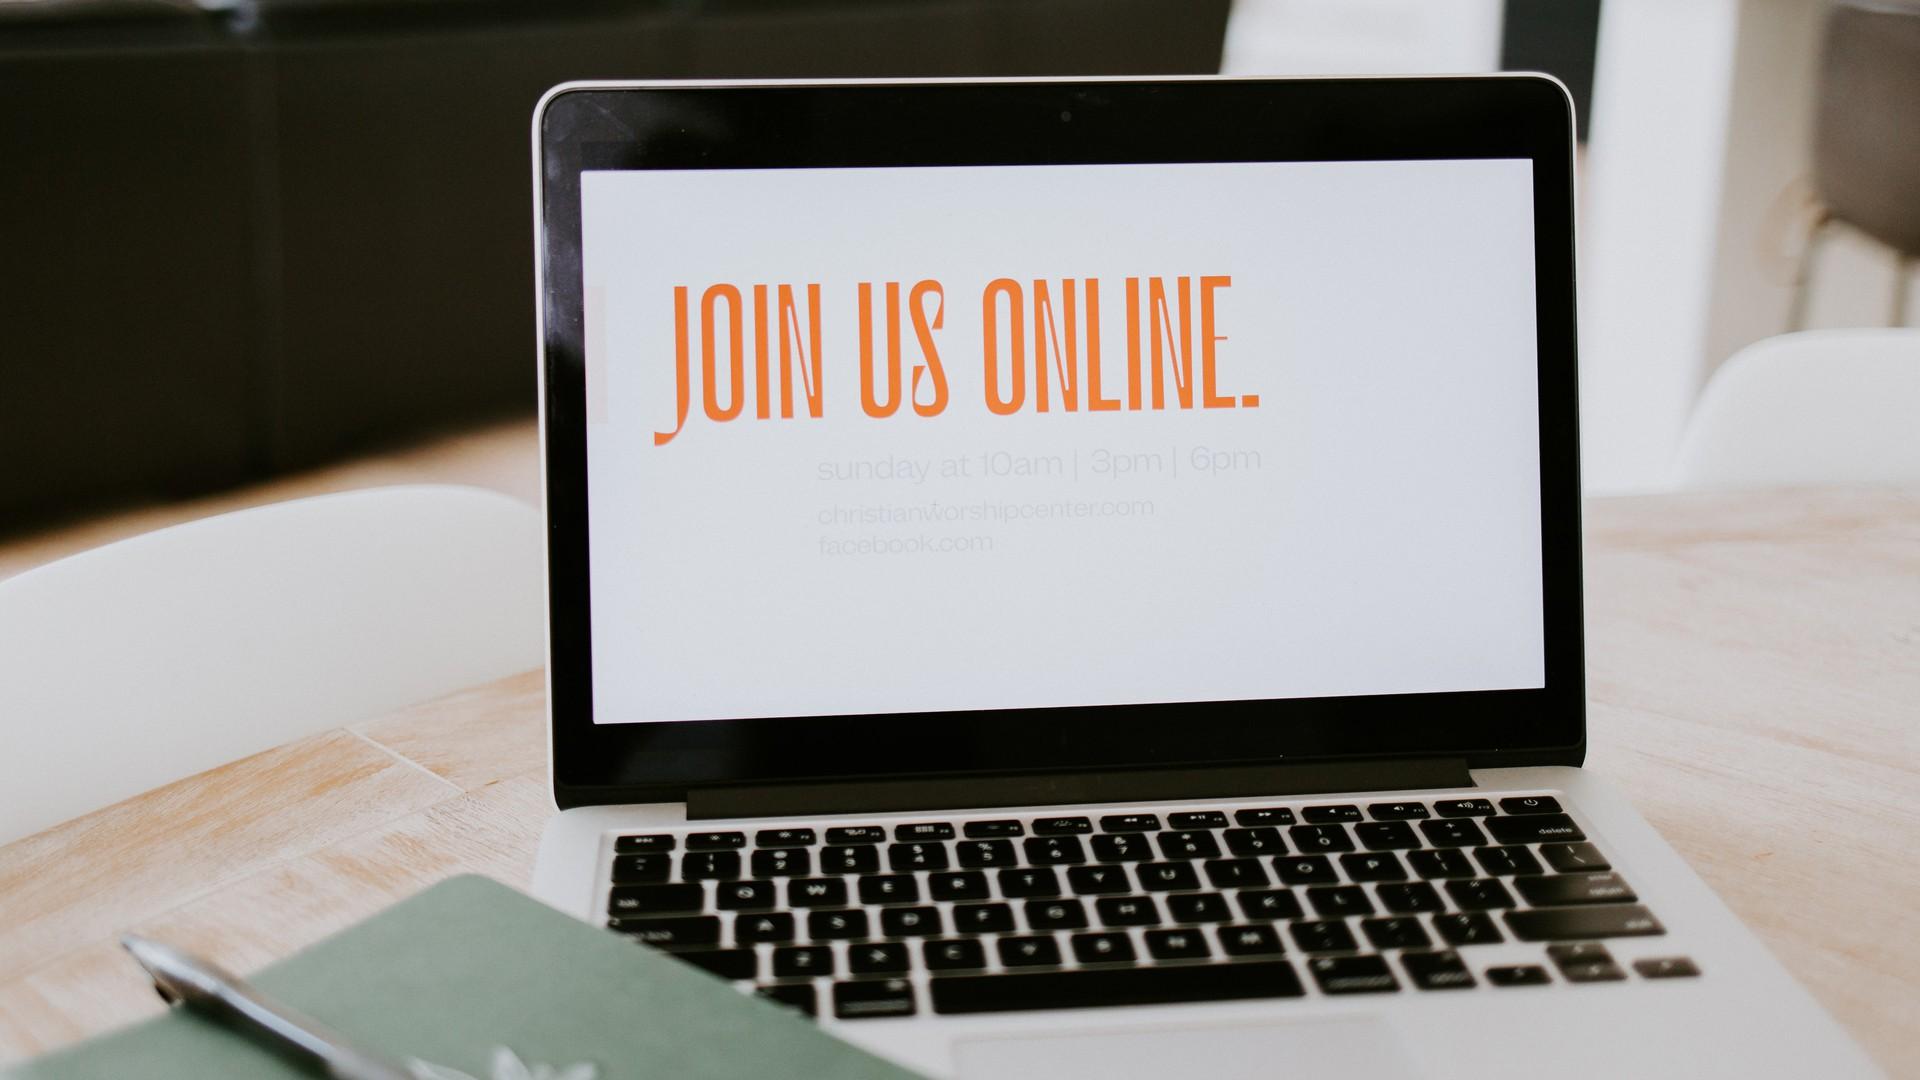 Join-us-online-pc(c)unsplash-samantha-borges.jpg